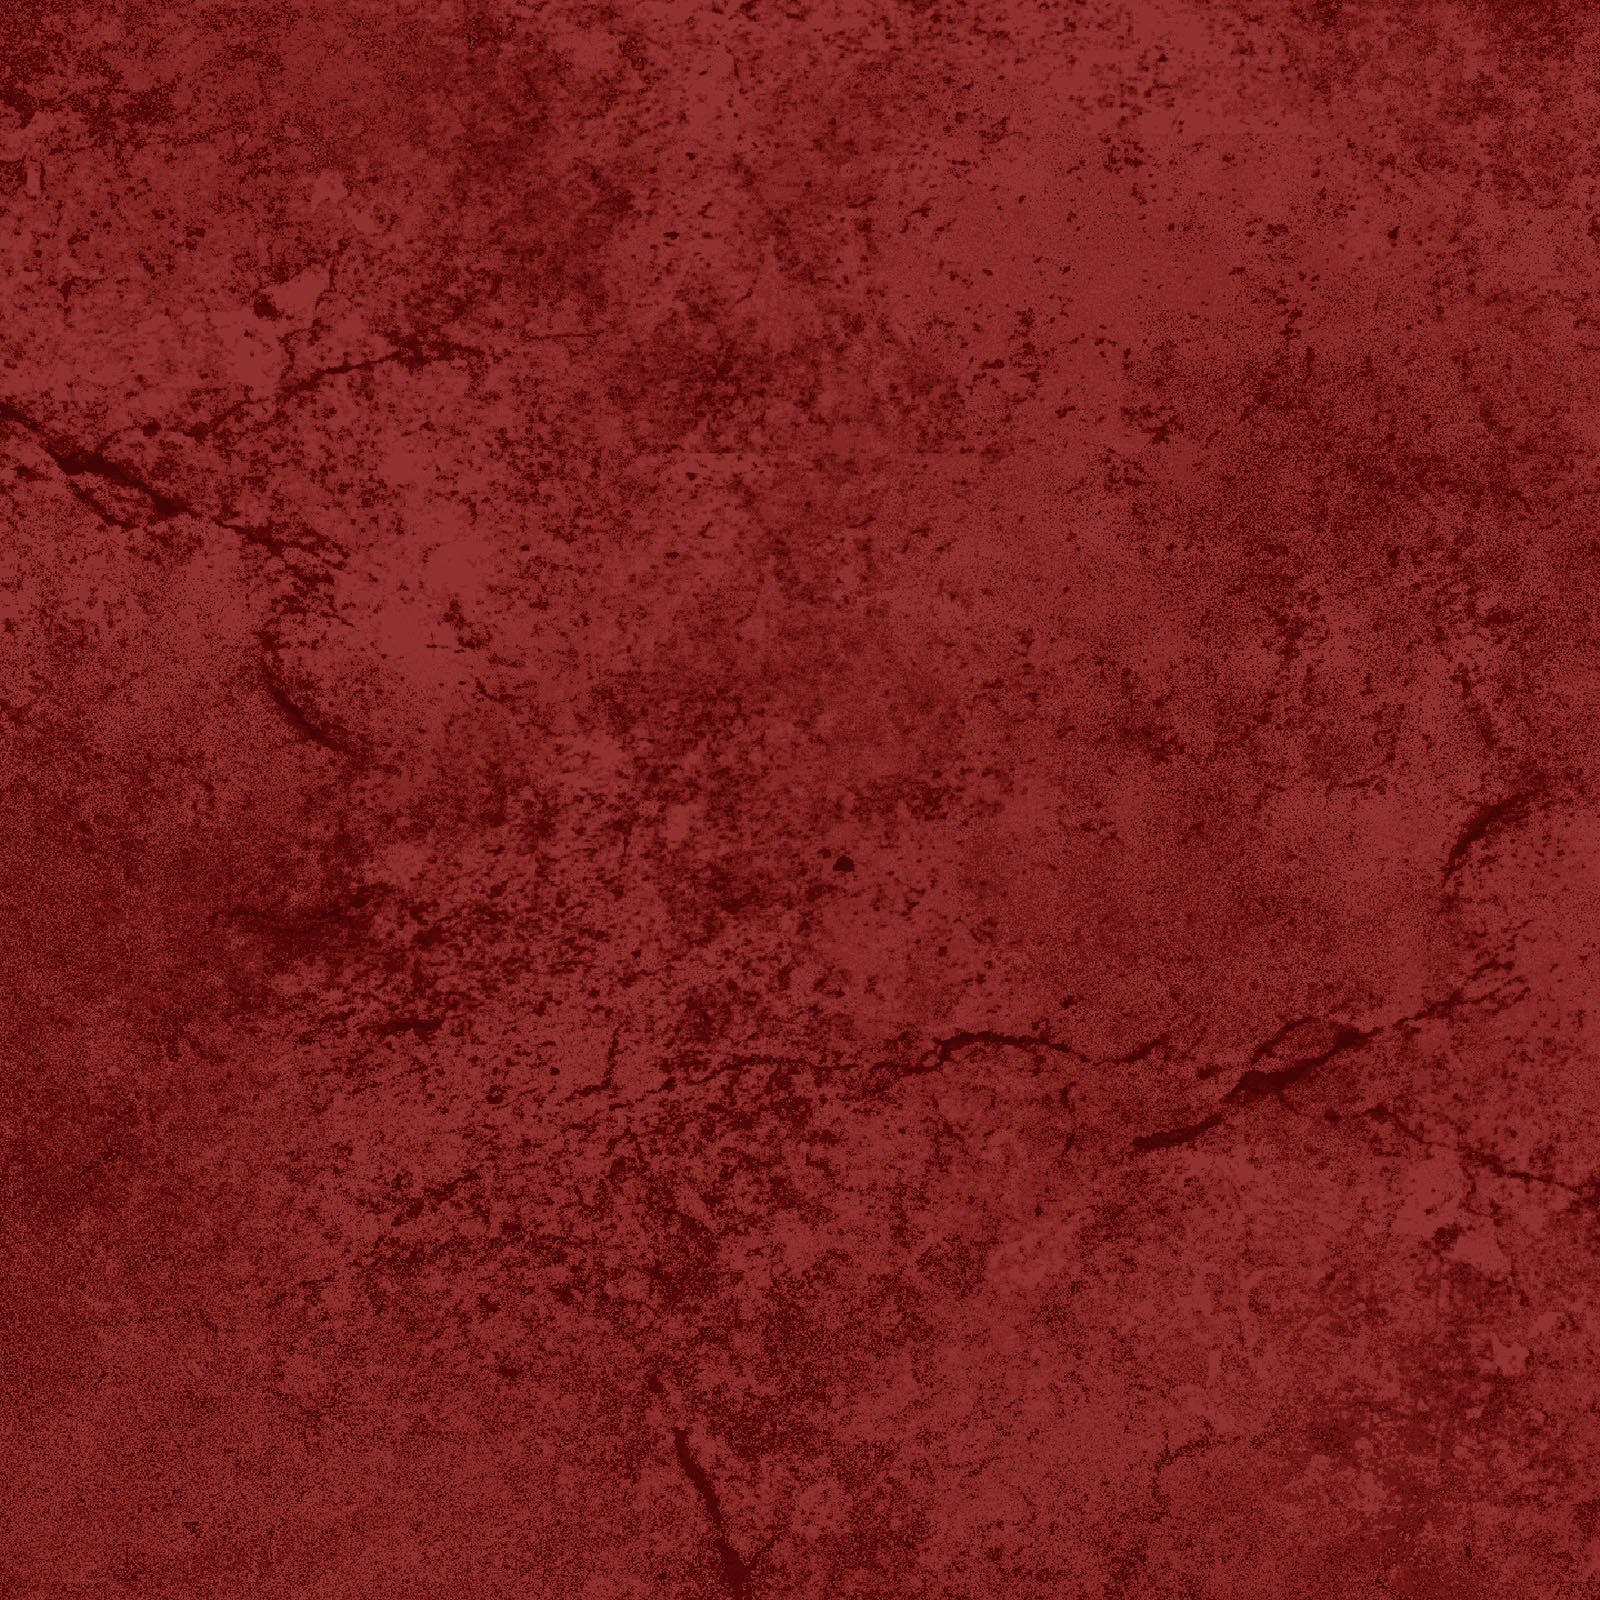 High Country  - Granite - Deep Red - Maywood Studio - 714329952352 - 1533253903